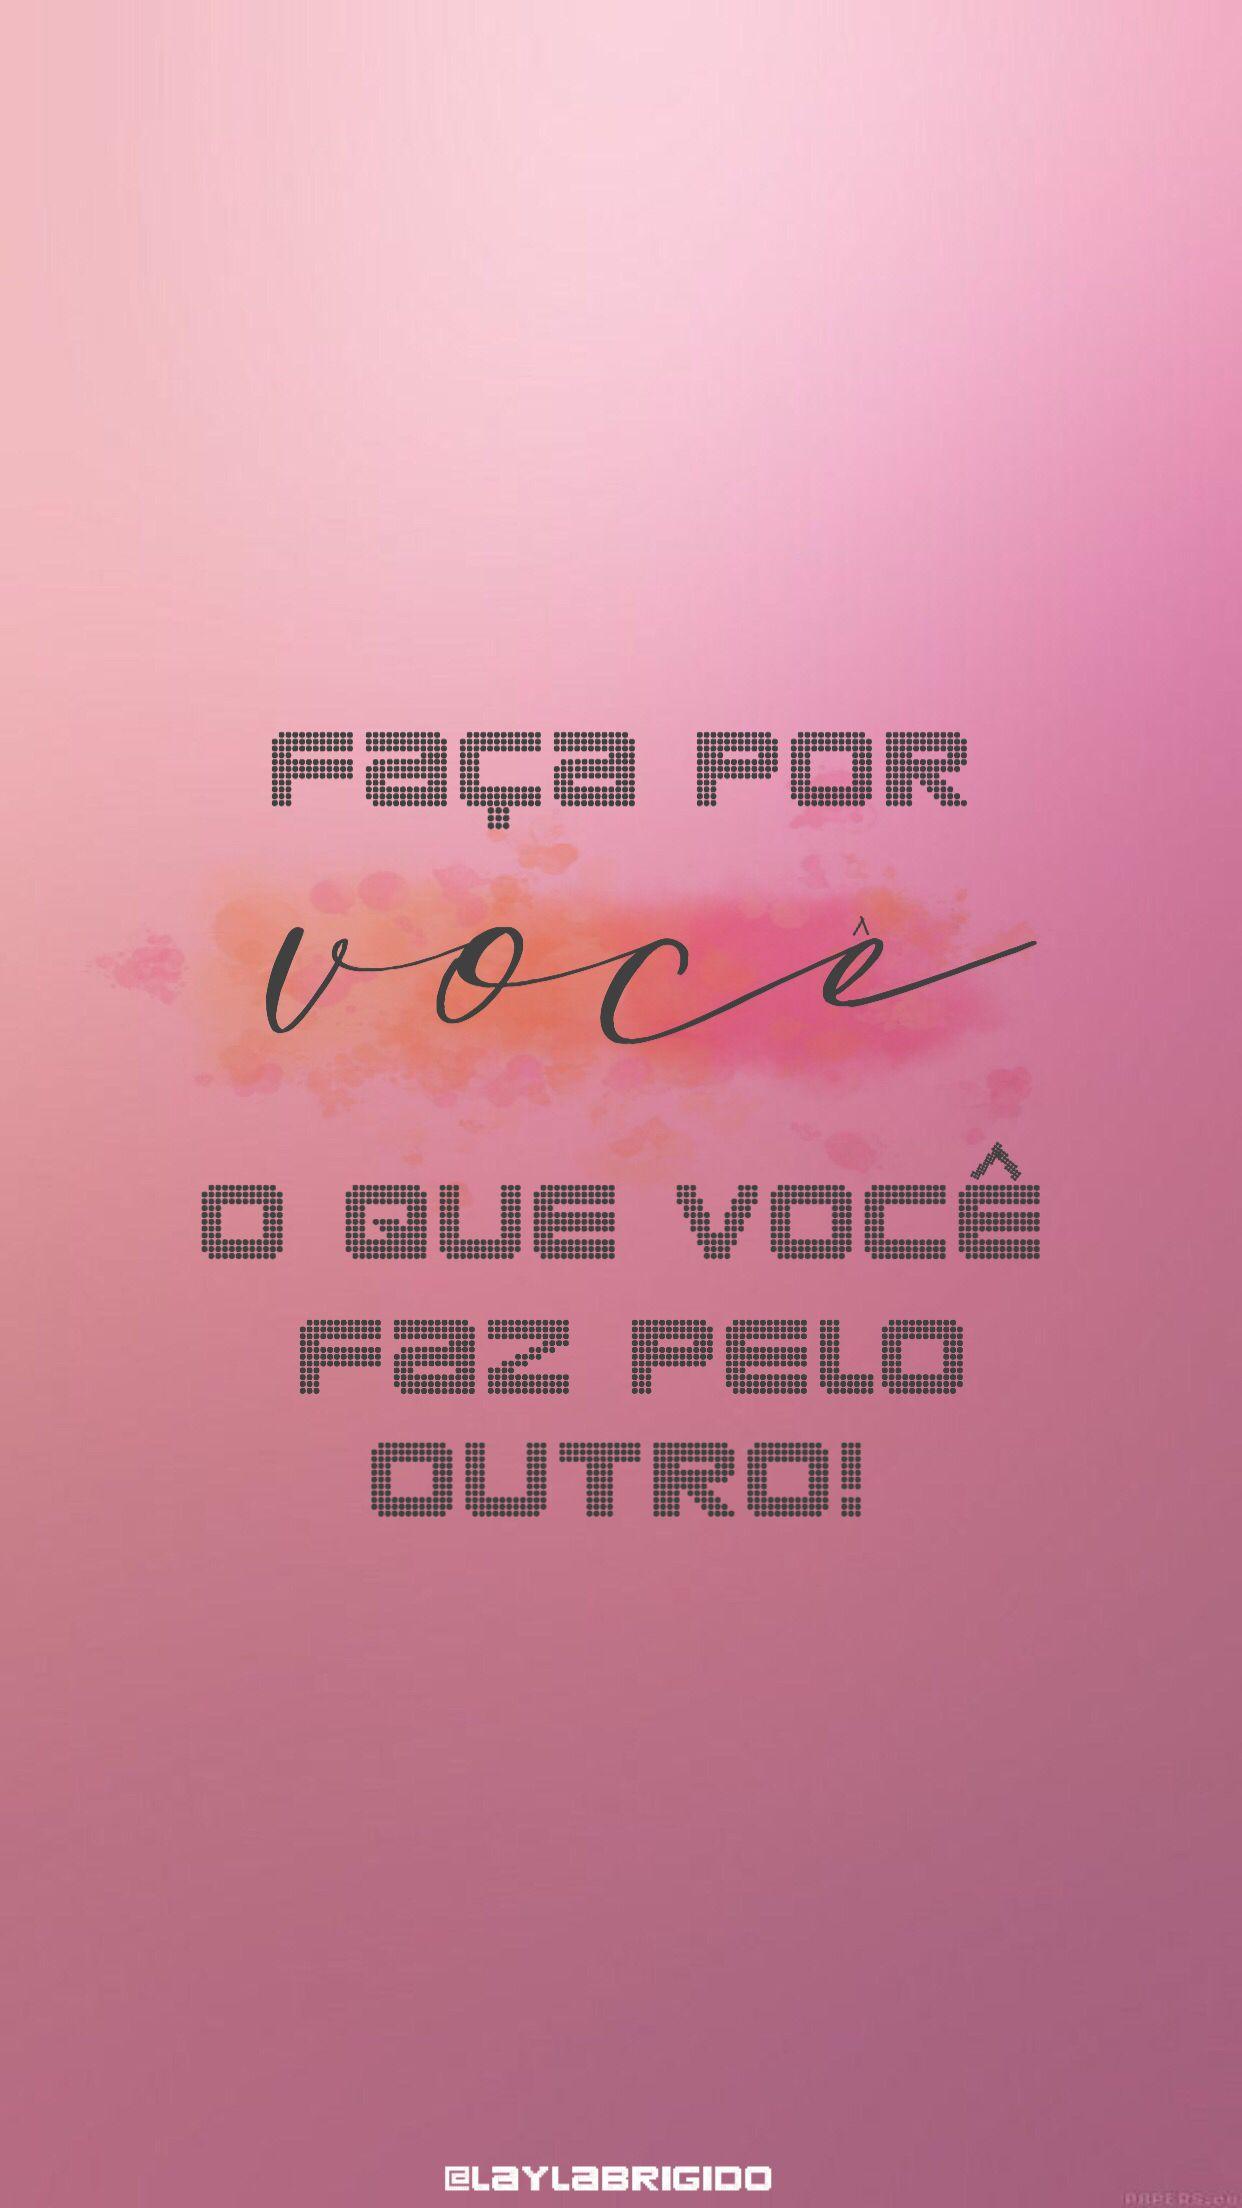 Wallpaper Fundo De Tela Quotes Autoestima Girl Power